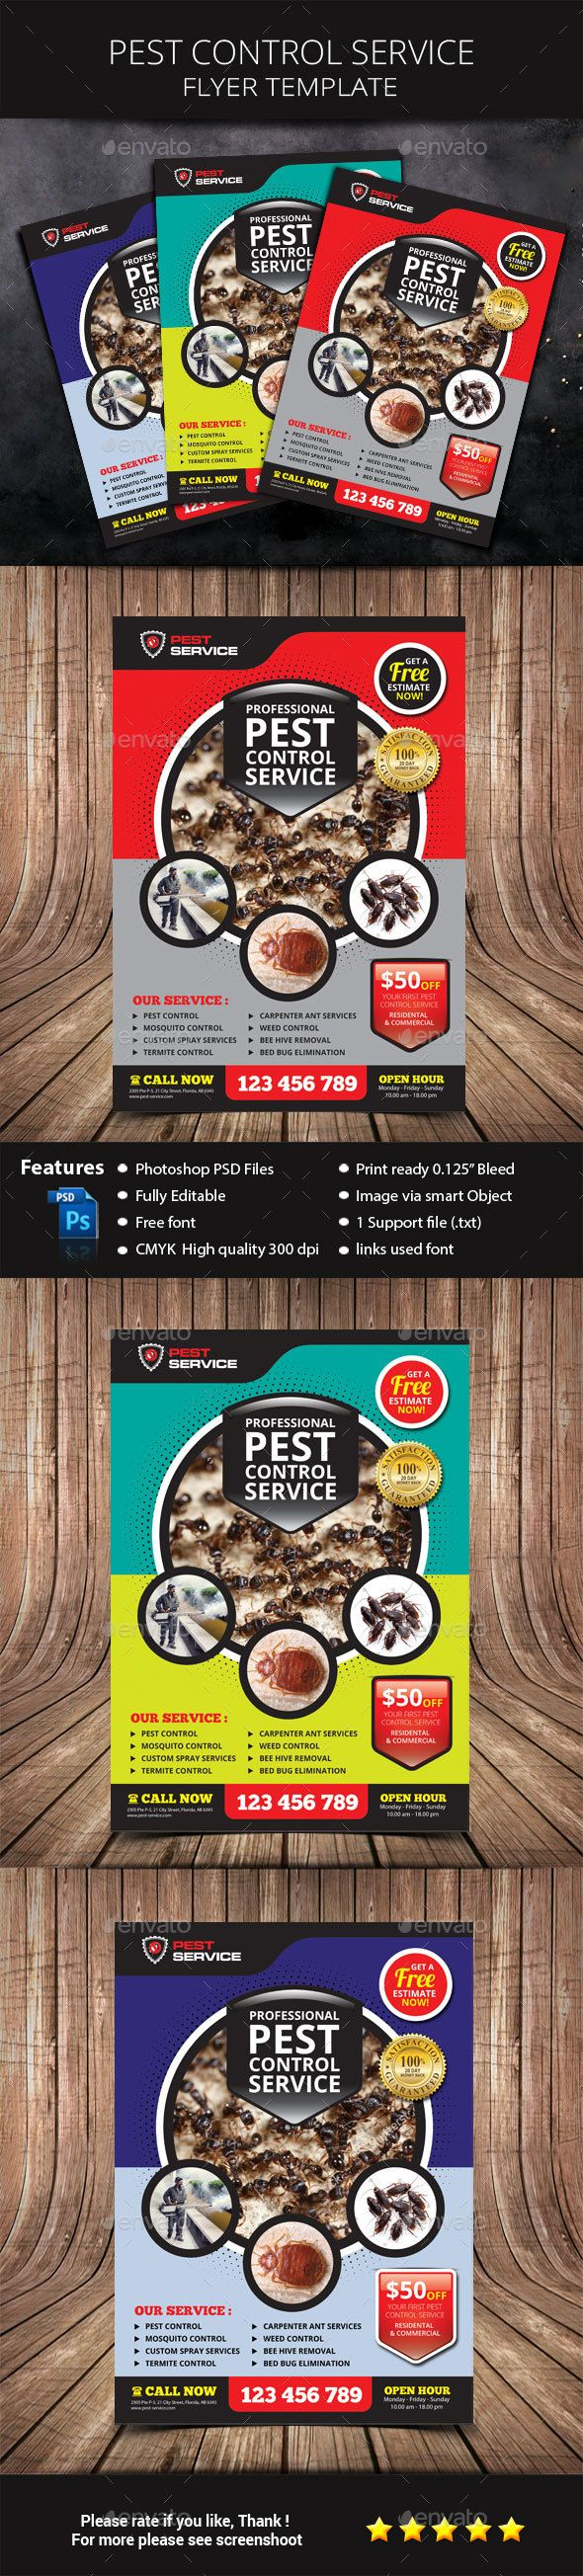 pest control service flyer commerce flyers